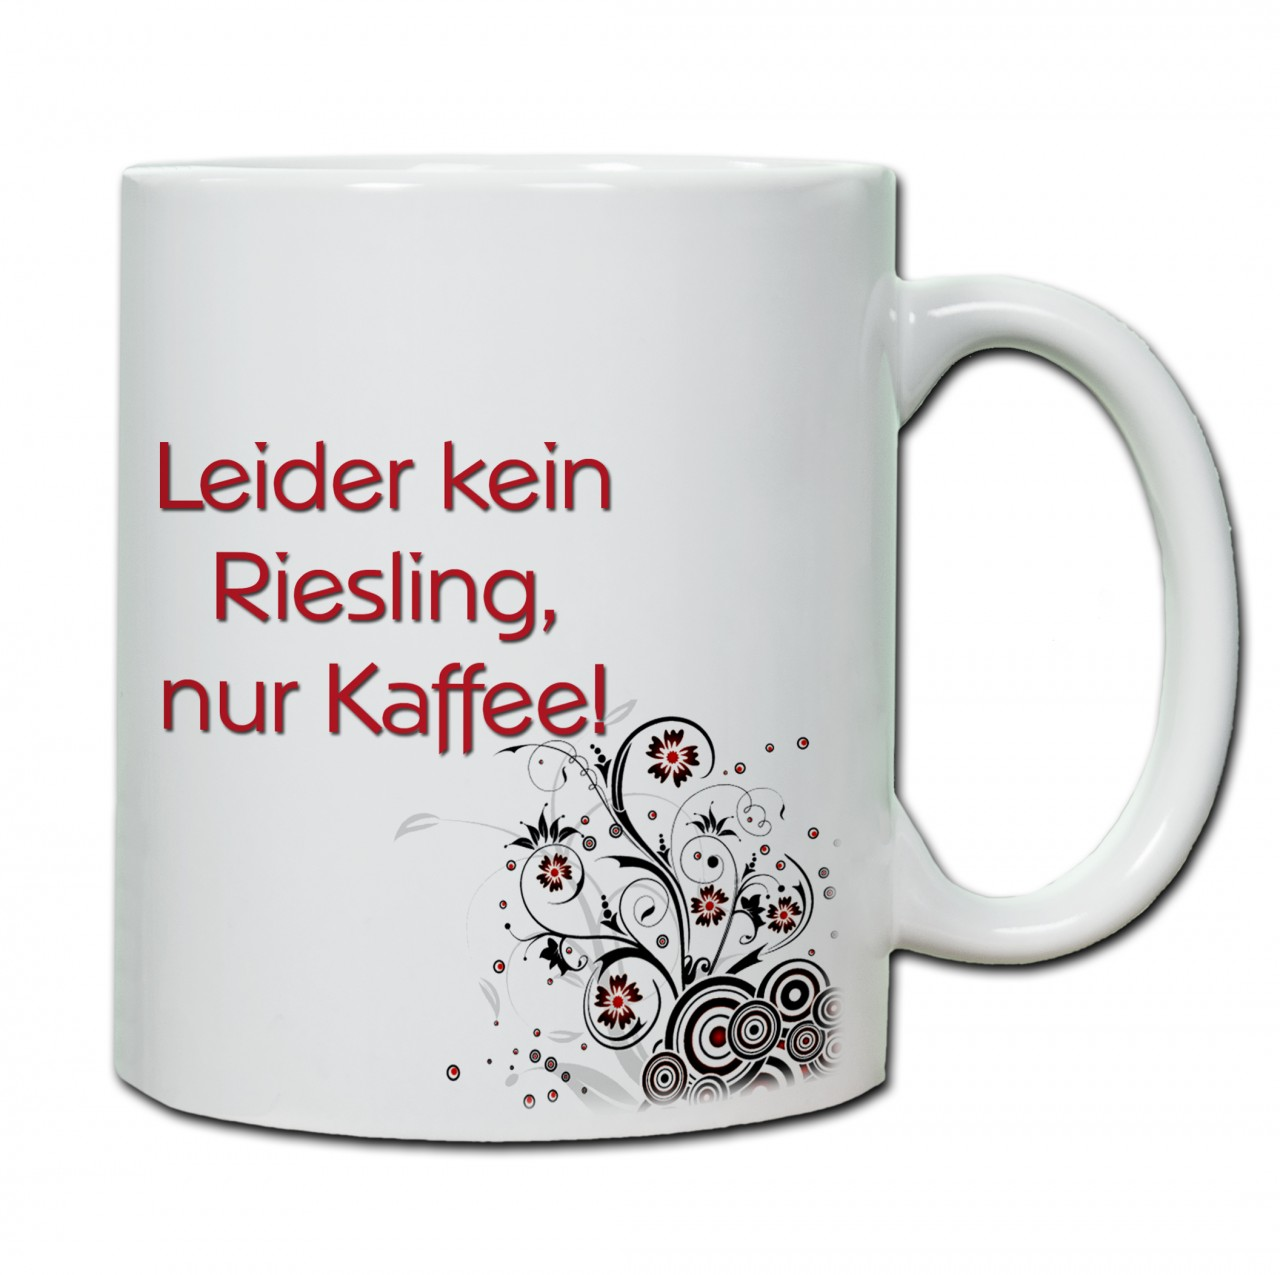 """Leider kein Riesling nur Kaffee"" Tasse, Keramiktasse"